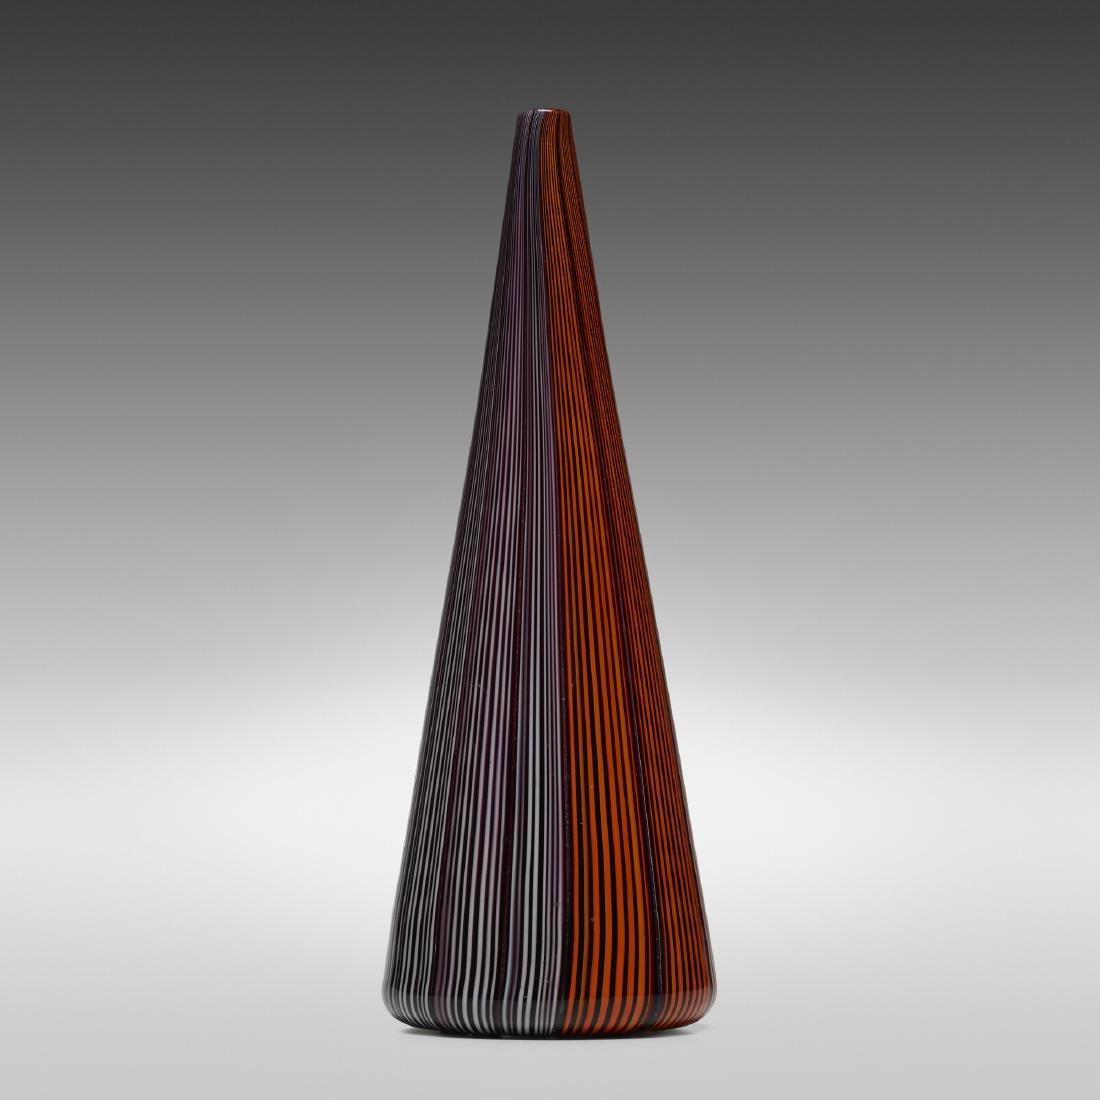 James Carpenter, Tessuto vase